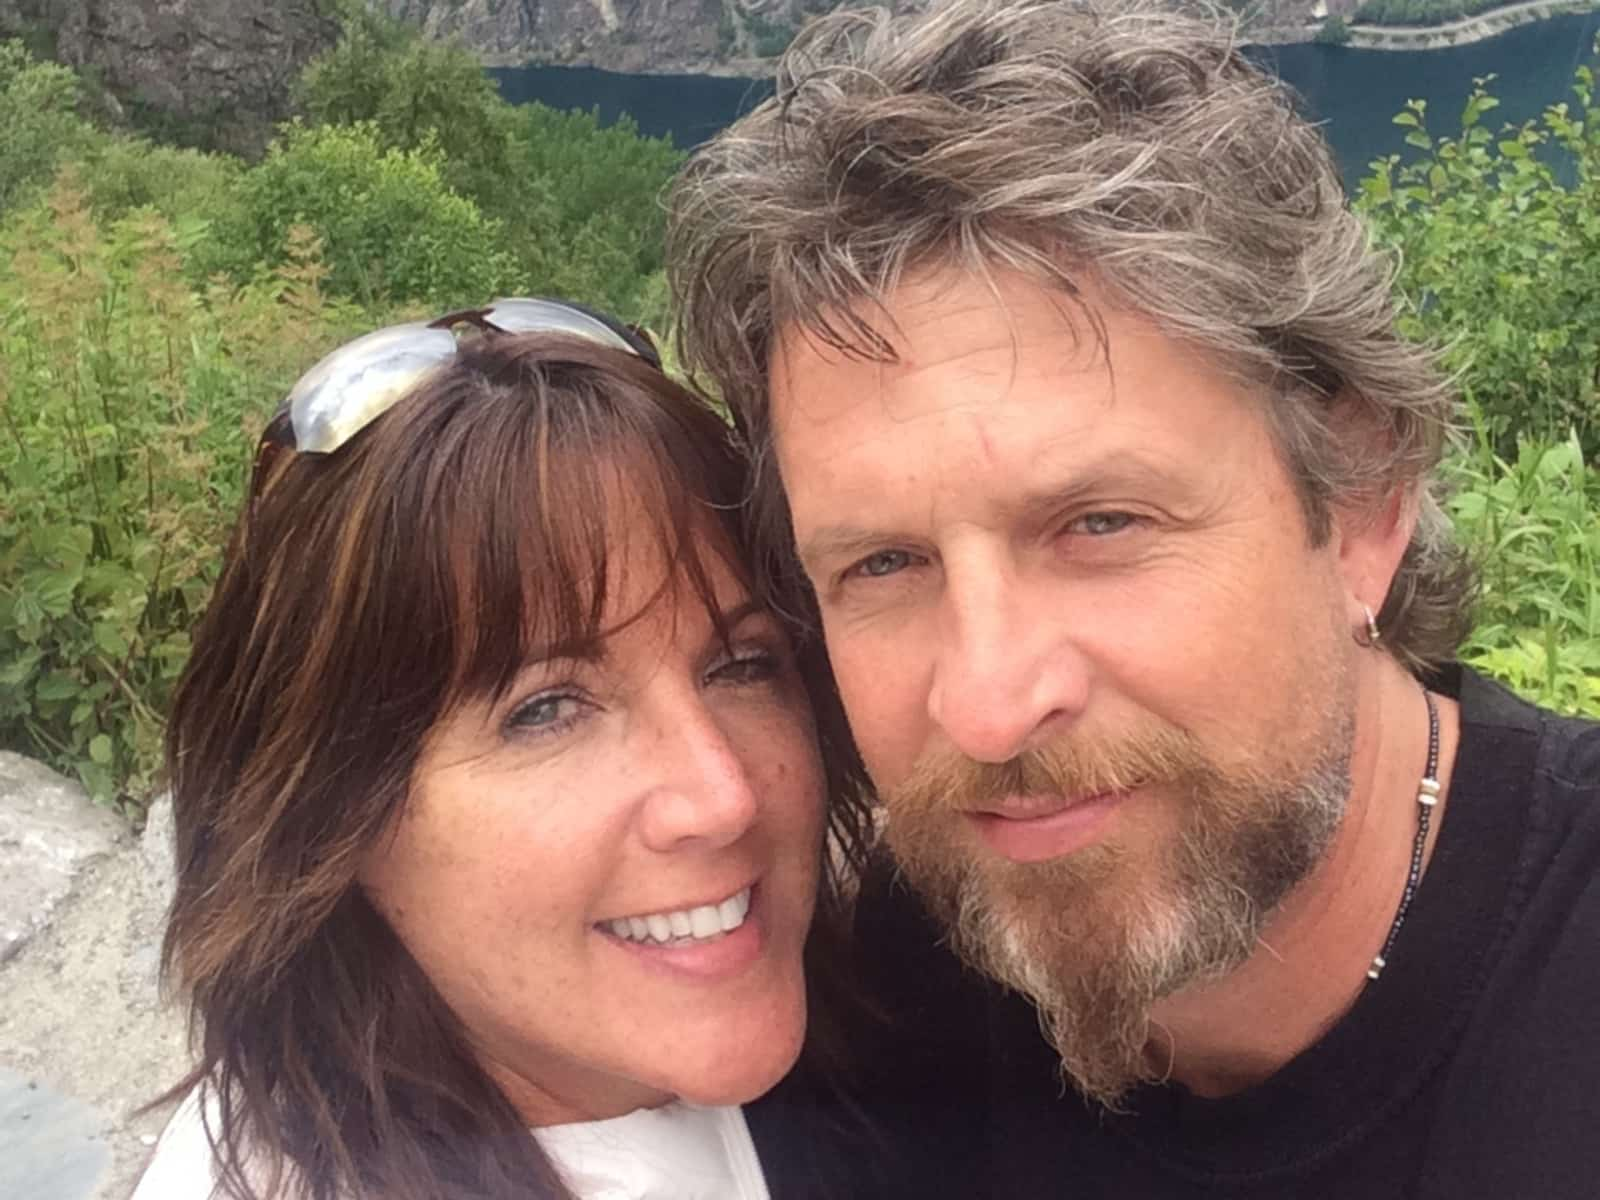 Jeffrey and kristen & Kristen from Stowe, Vermont, United States